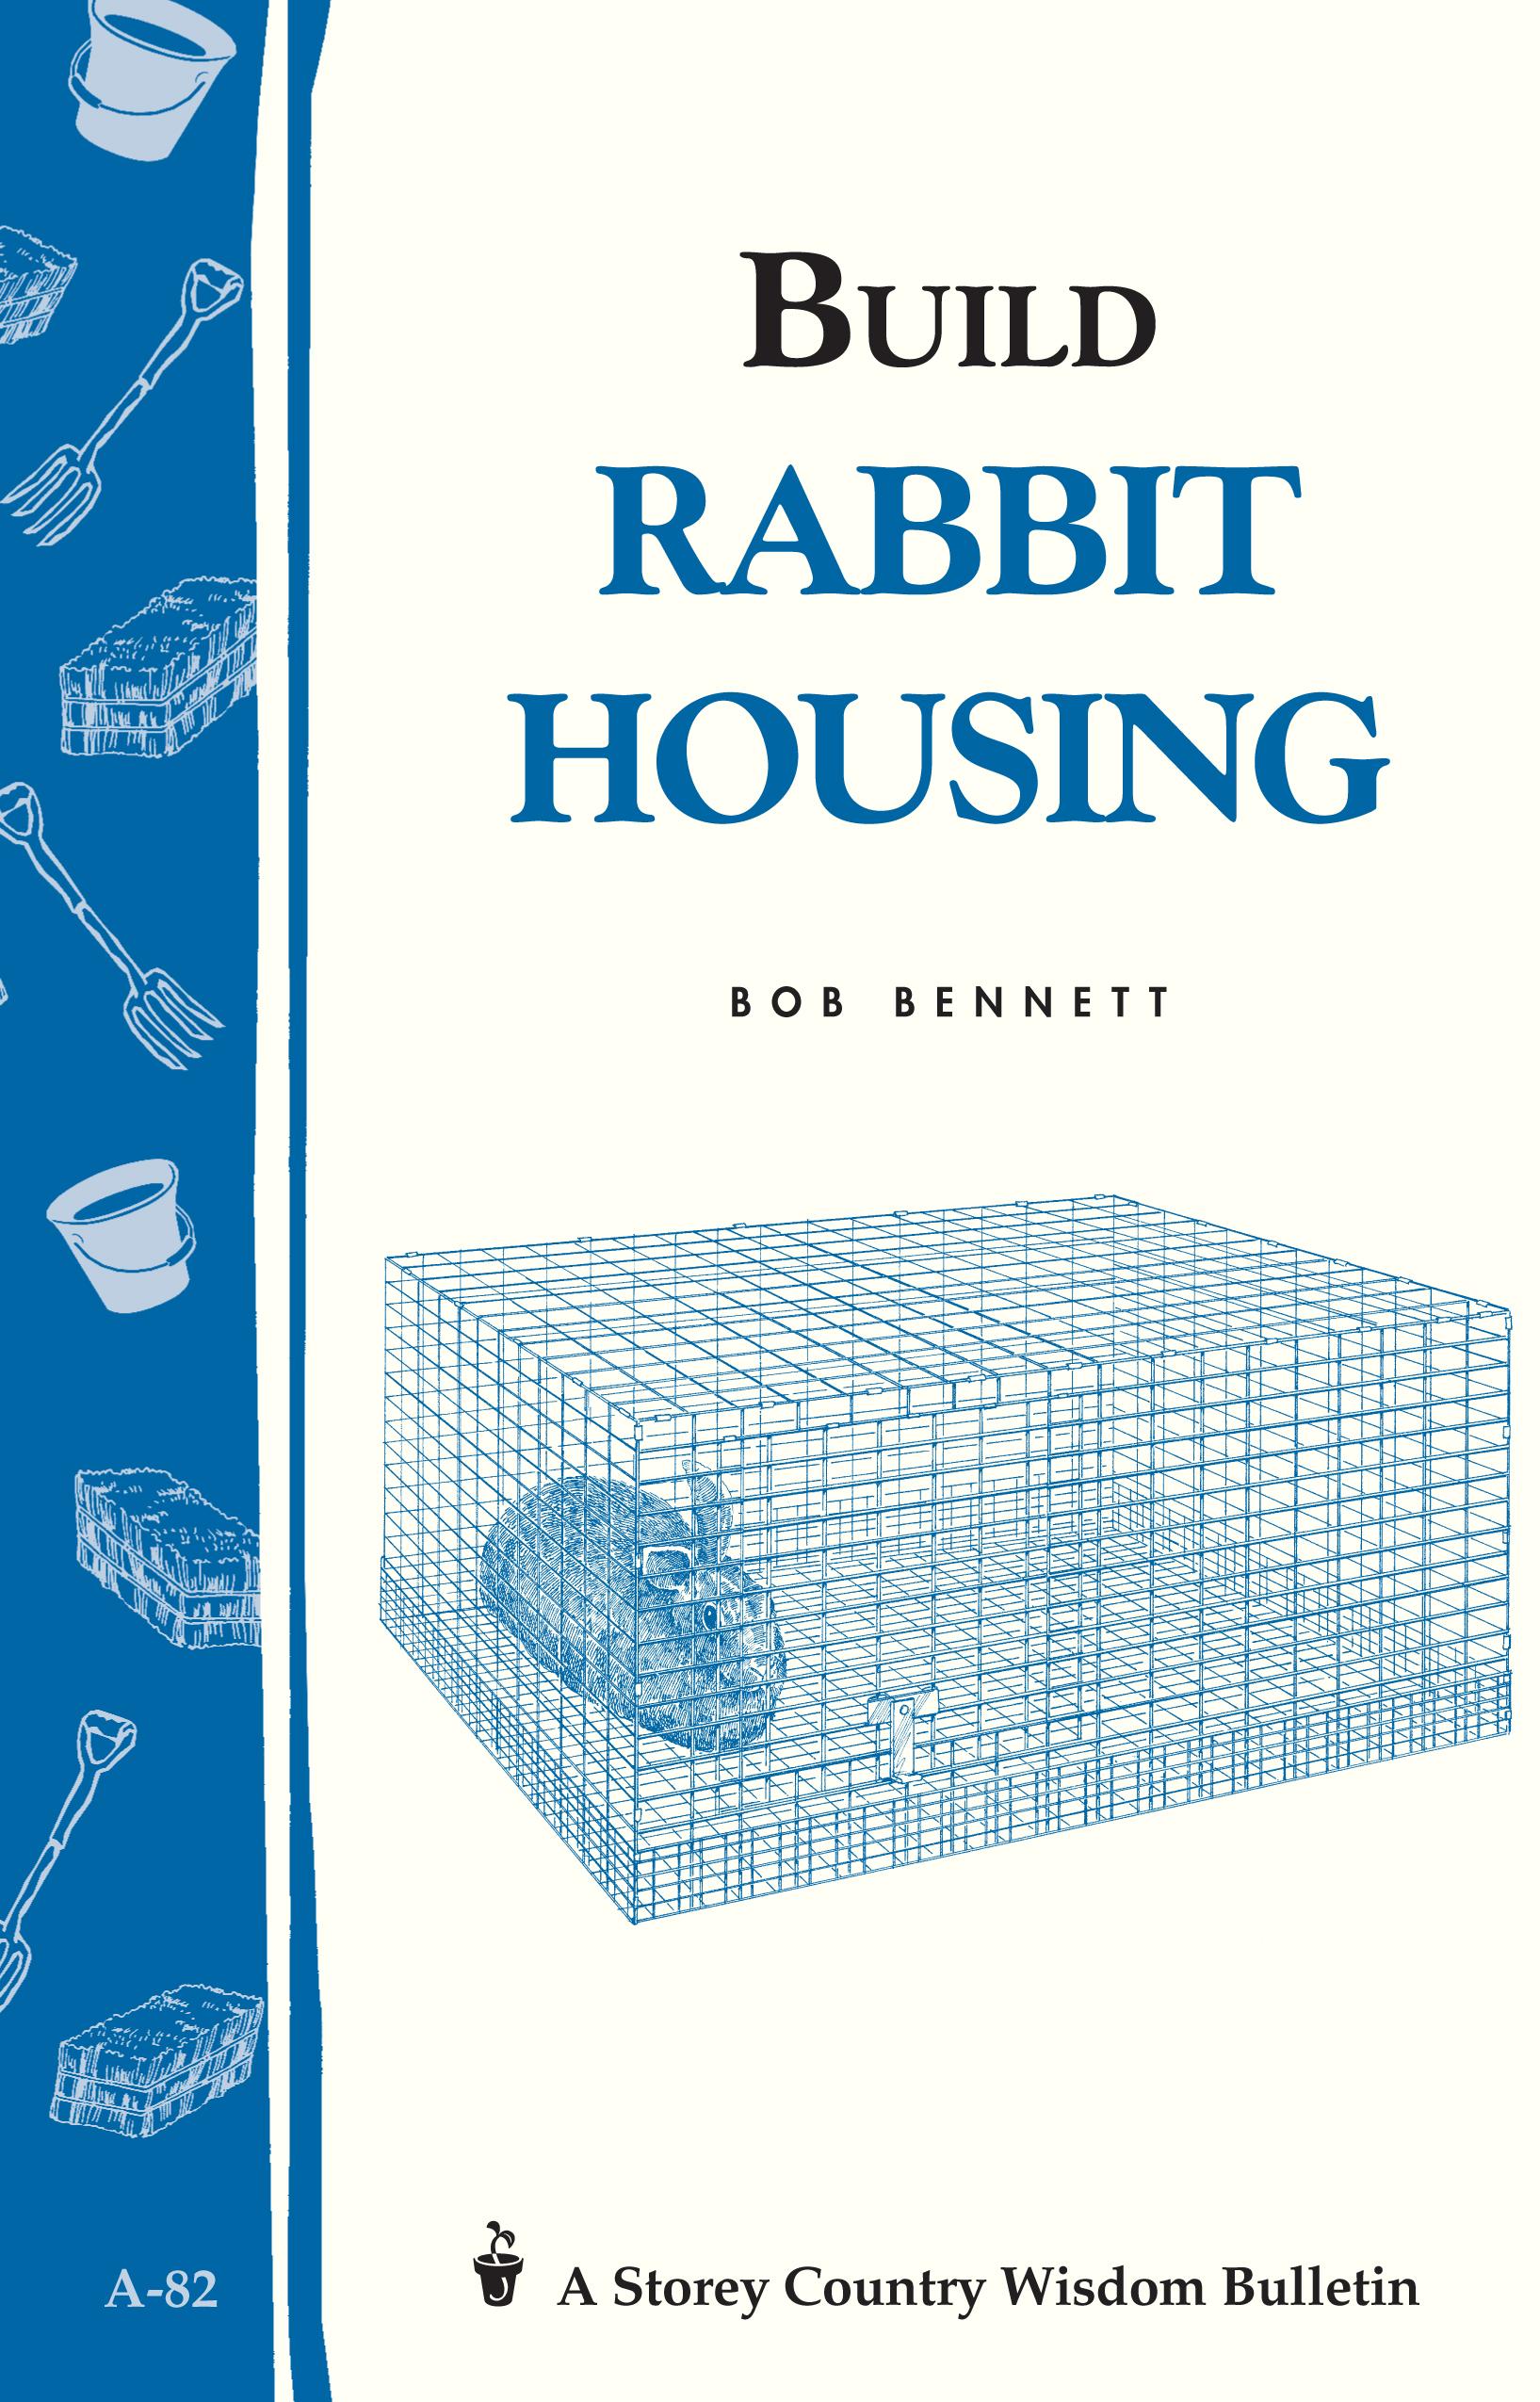 Build Rabbit Housing Storey Country Wisdom Bulletin A-82 - Bob Bennett